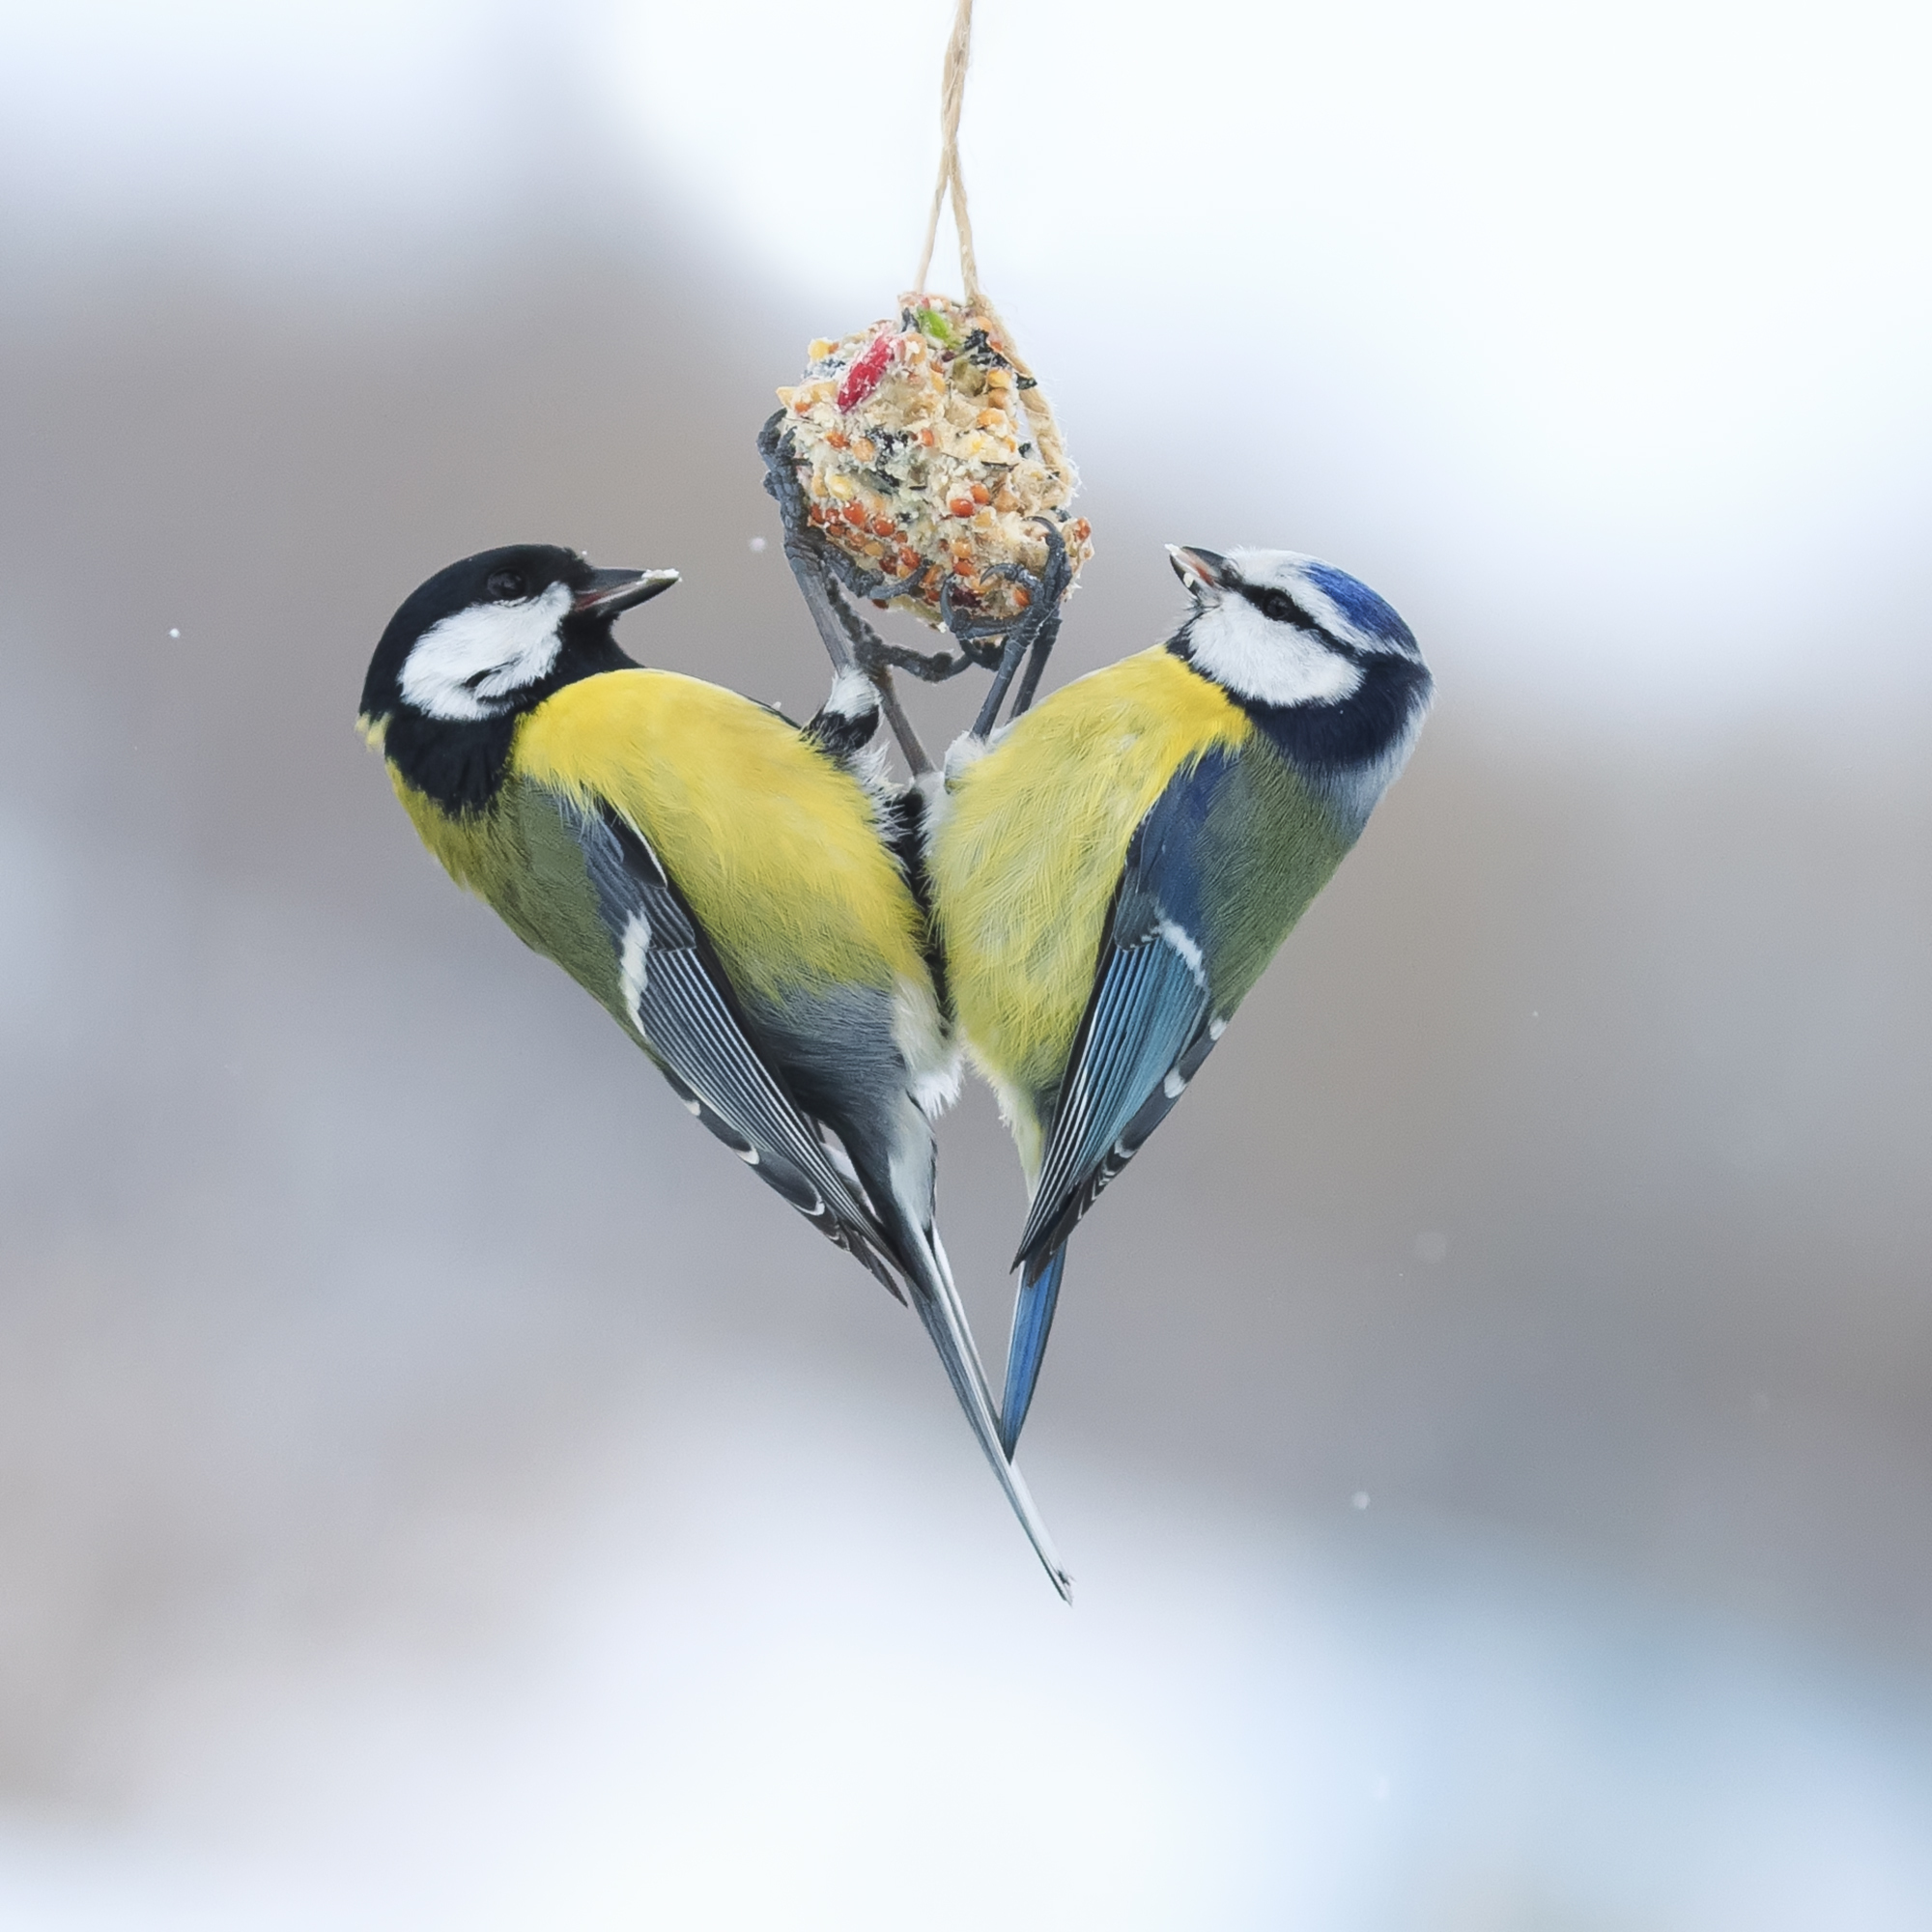 The Christmas Bird Count